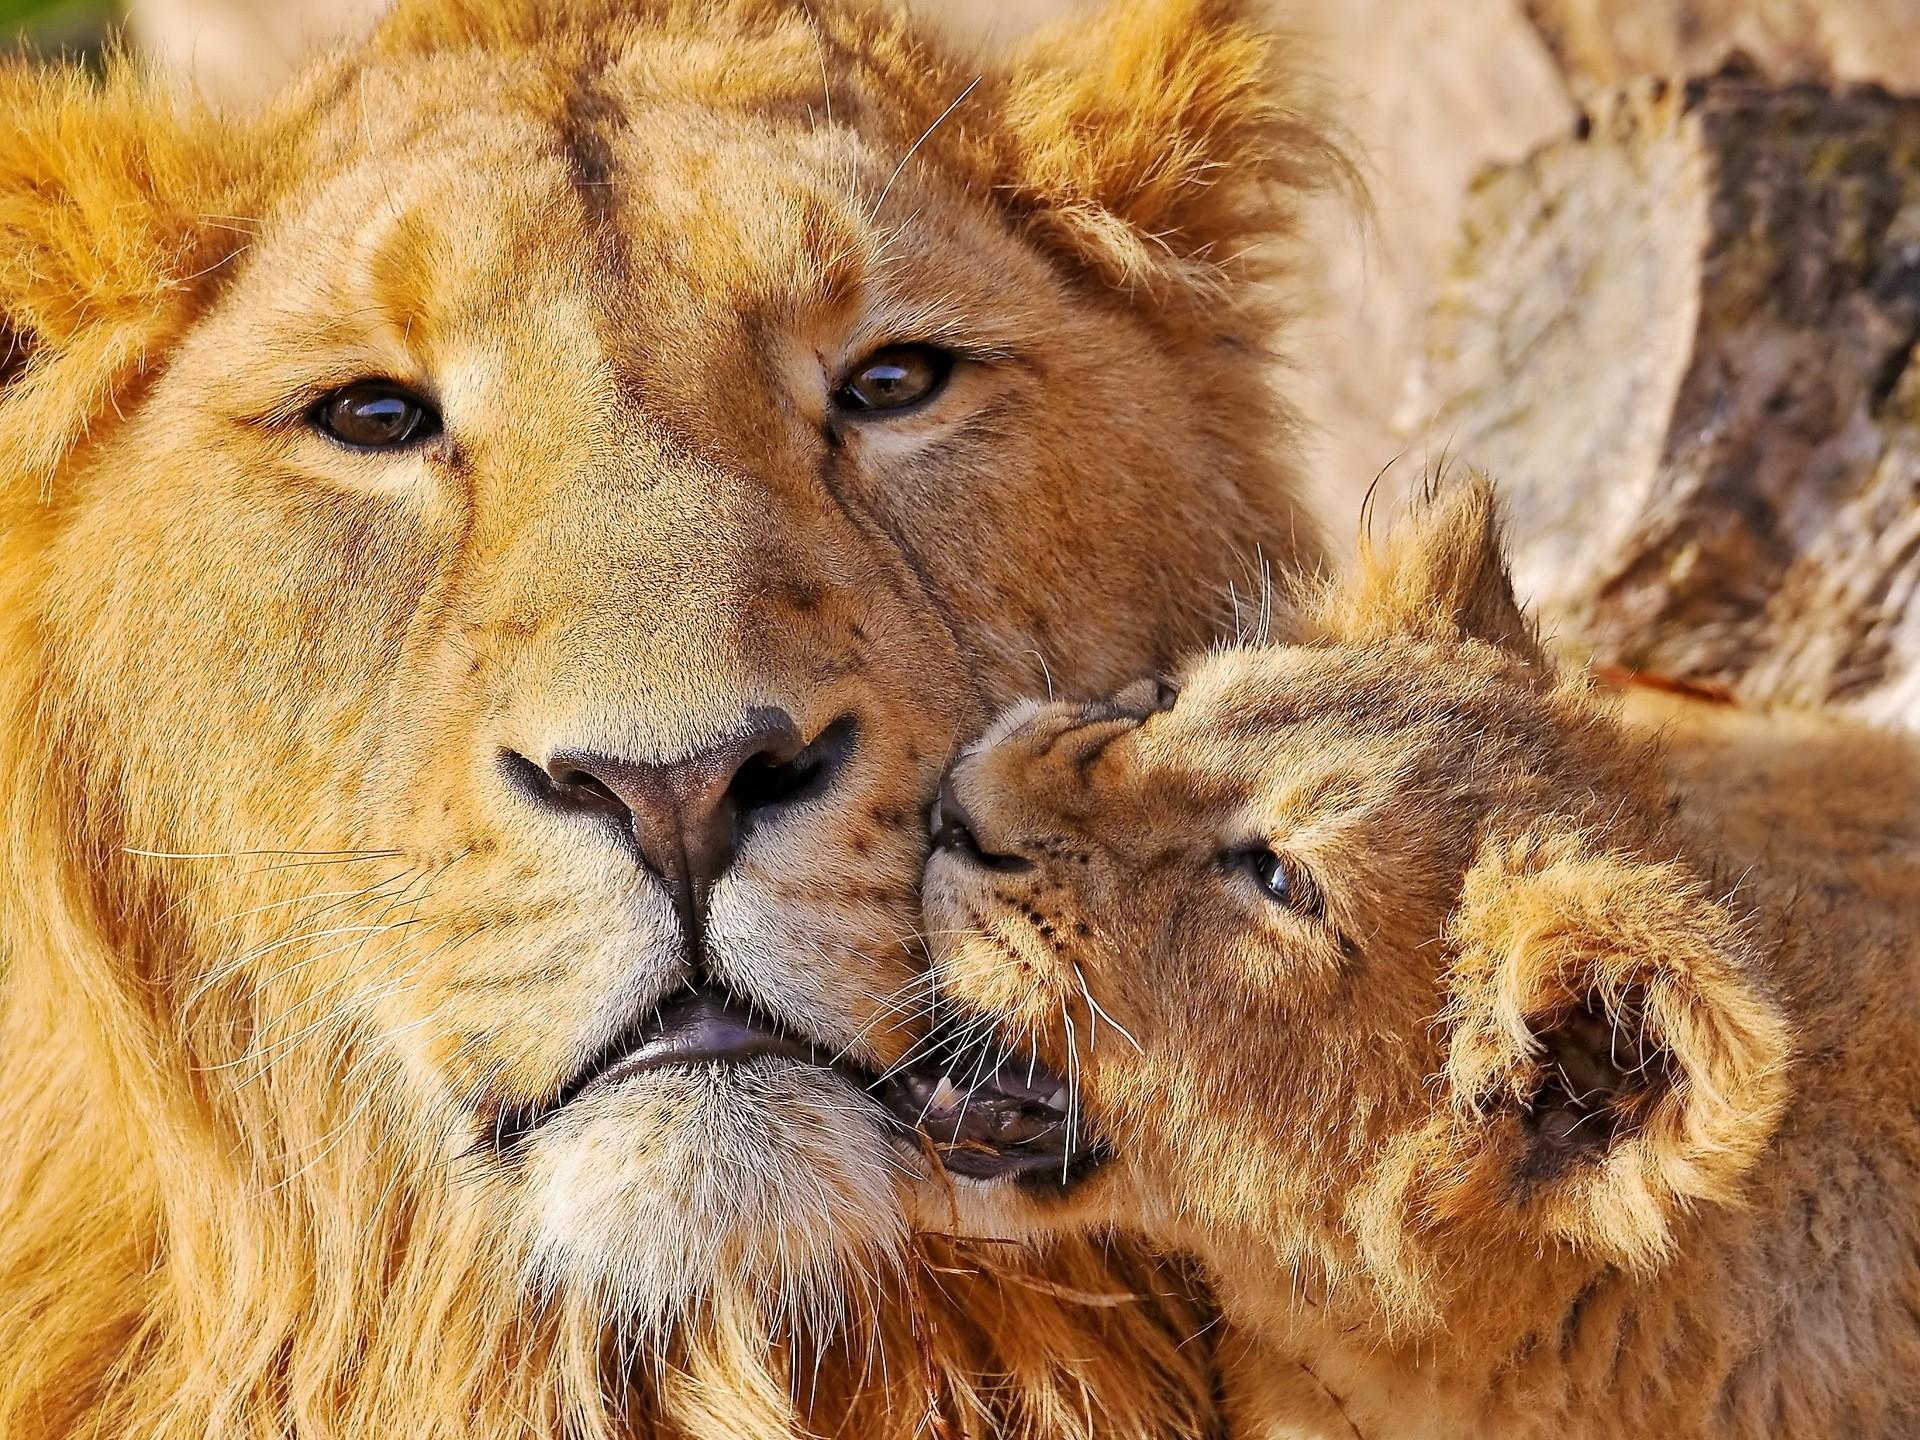 Wallpaper lion, face, cub, playful, caring